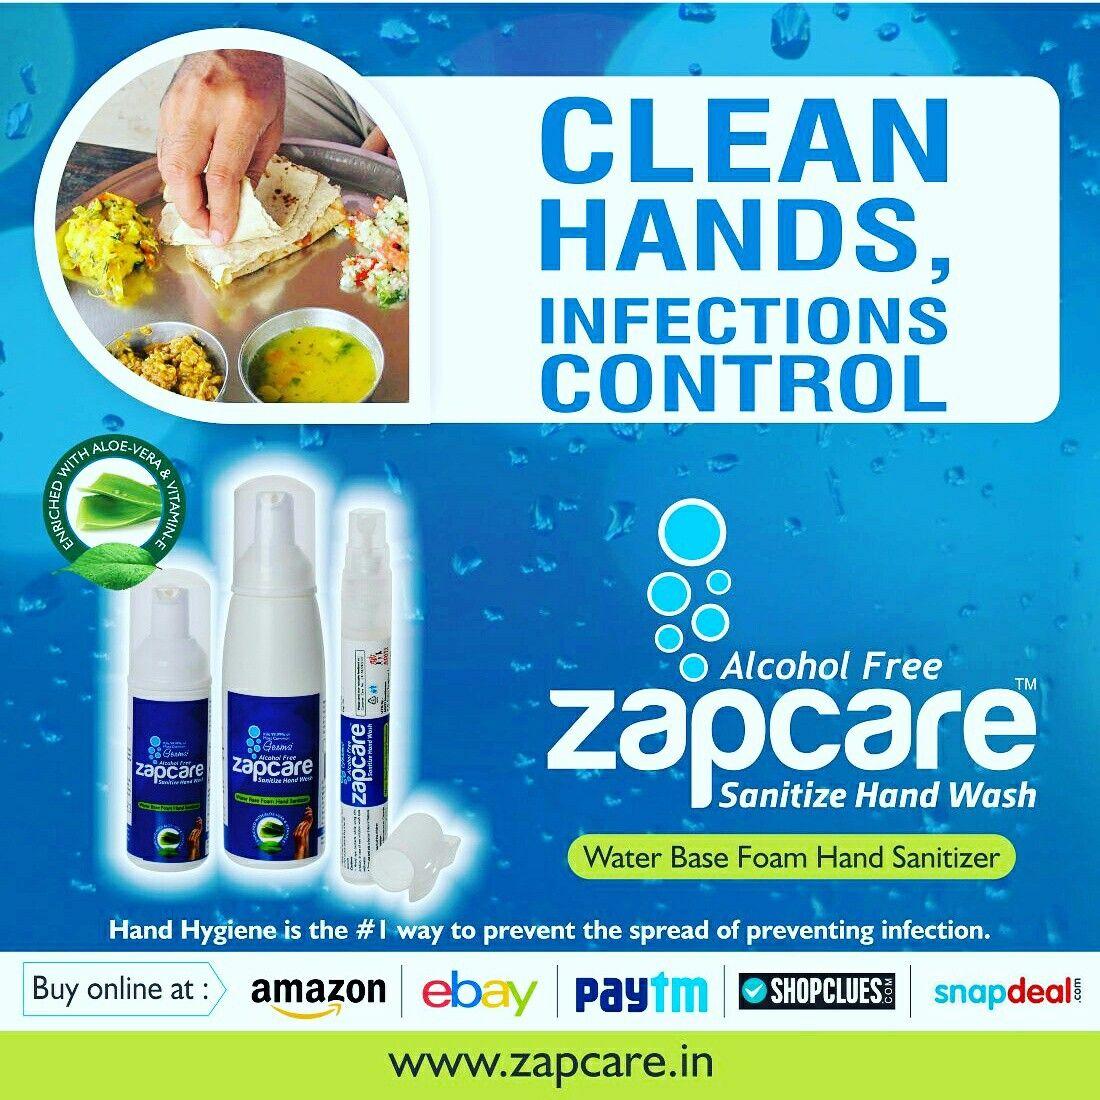 Pin by ZAPCARE on Hand hygiene Hand hygiene, Clean hands